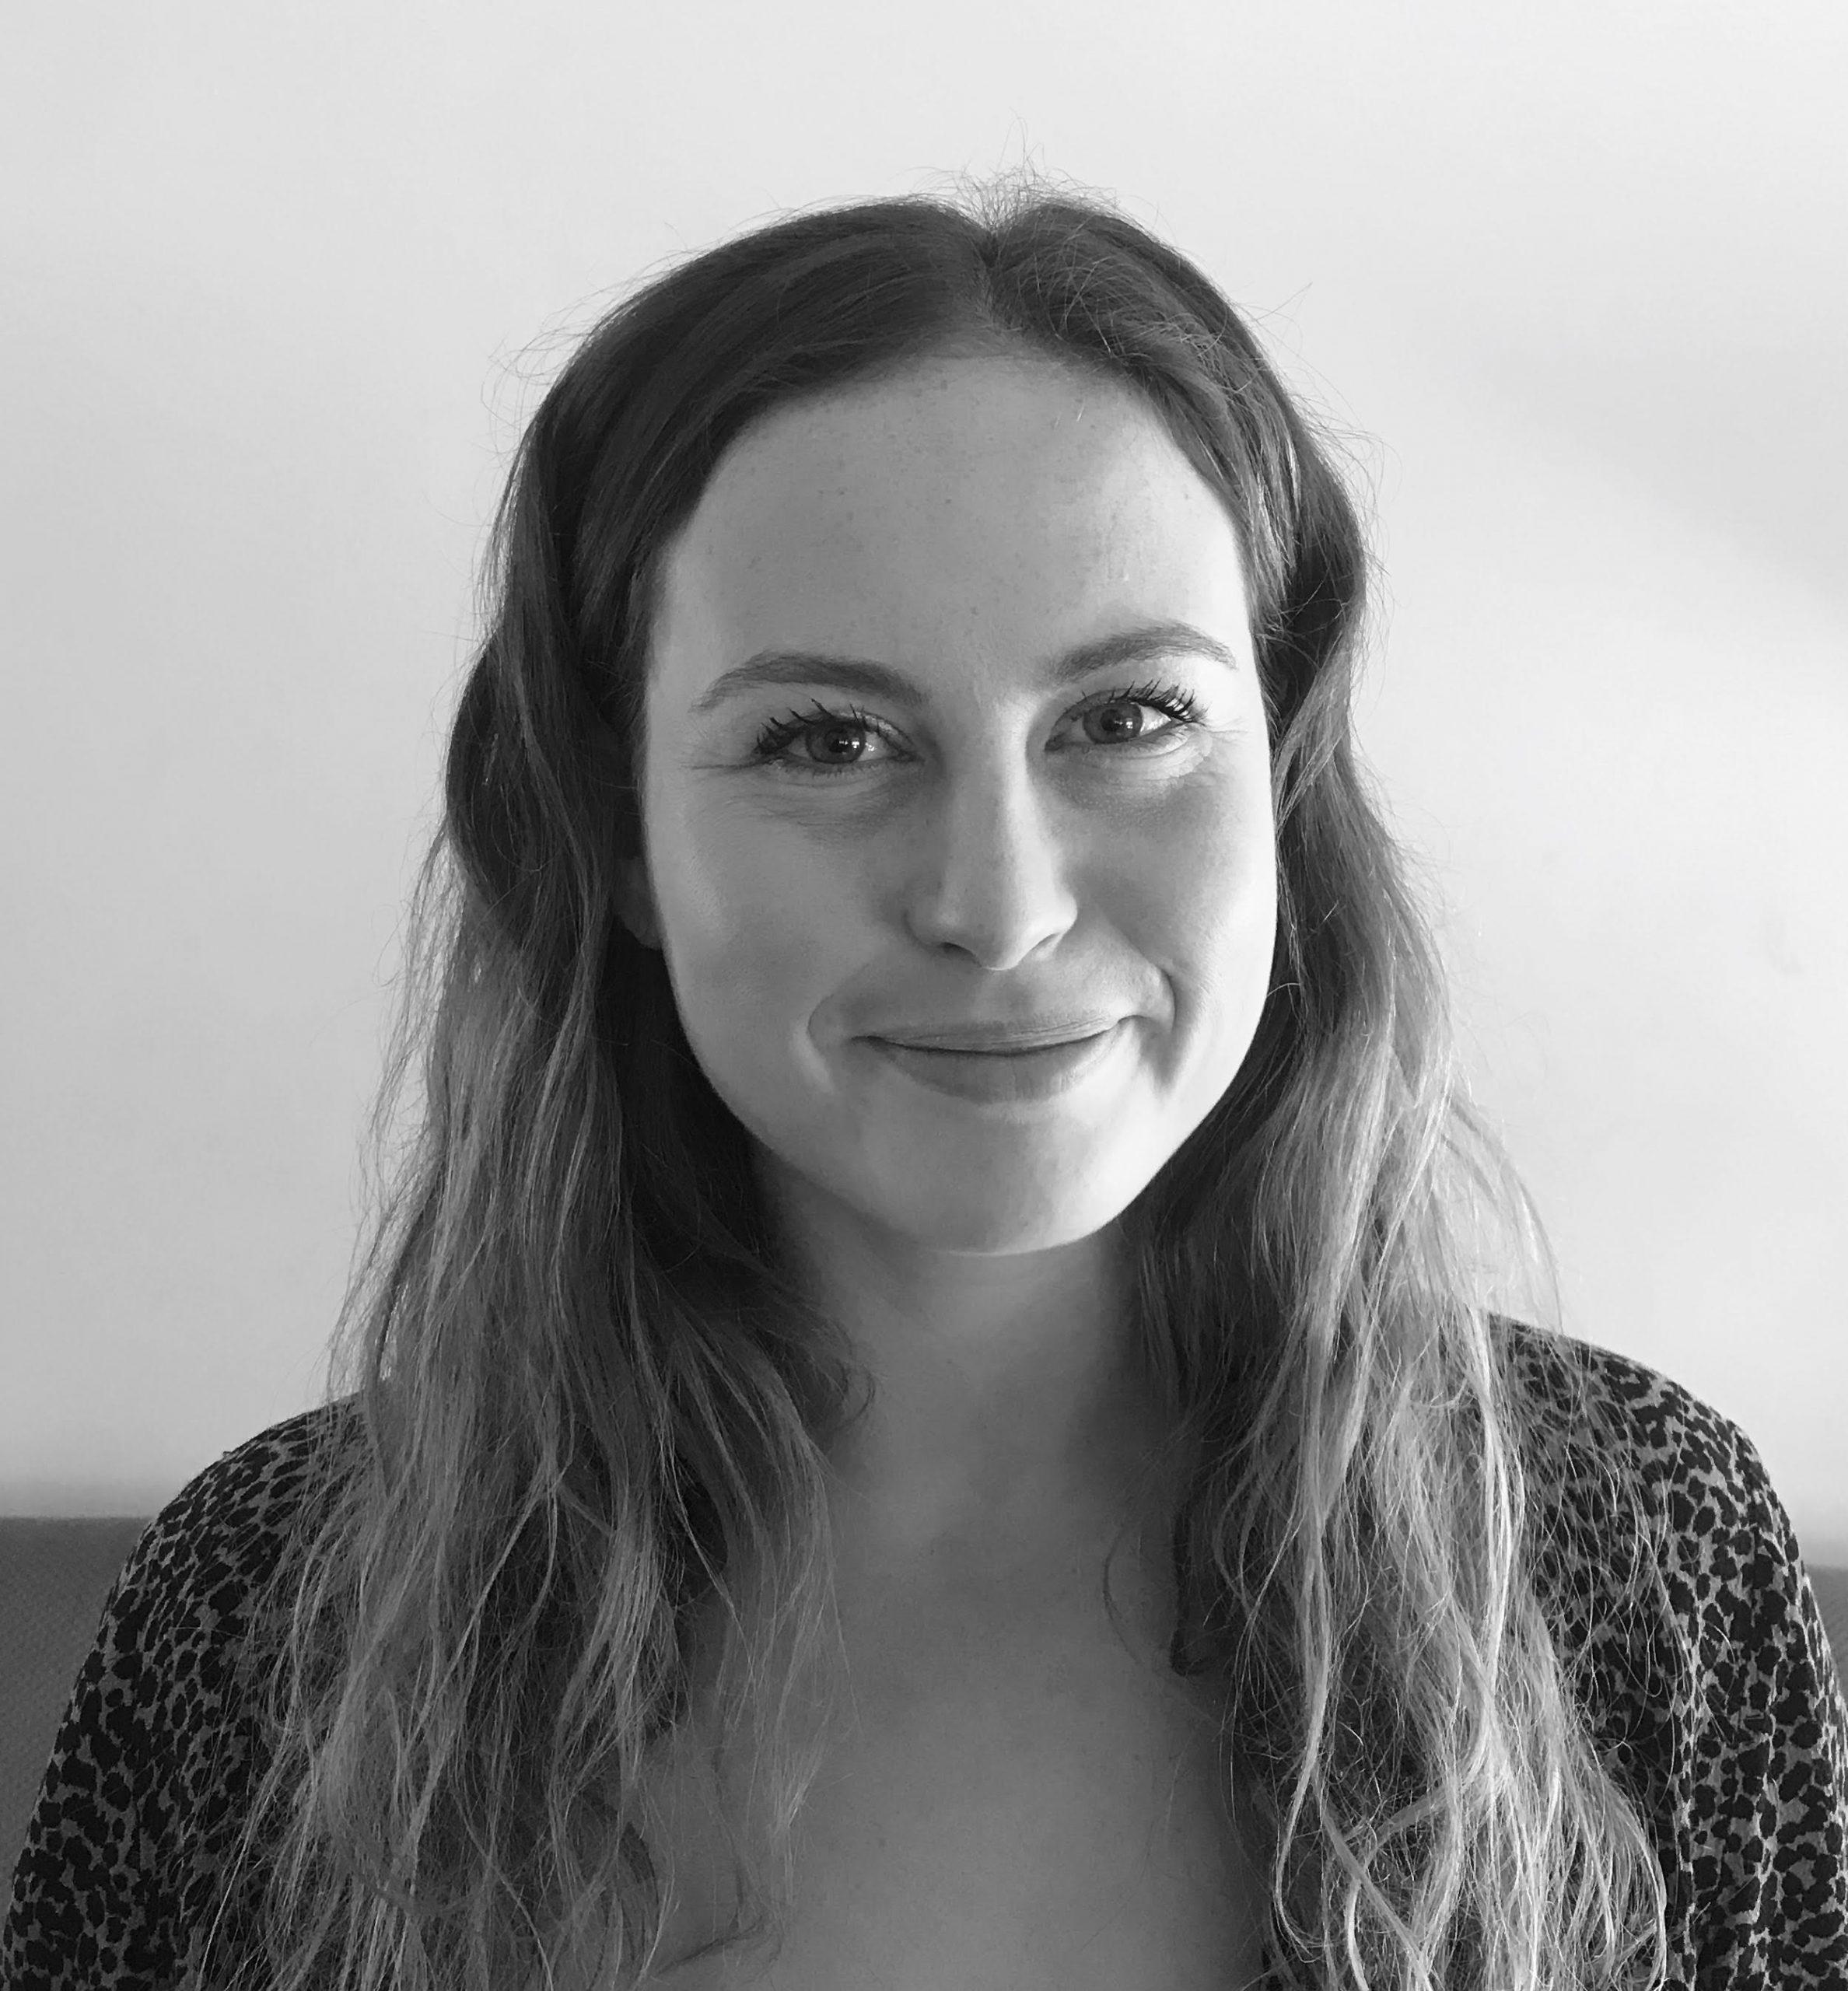 Isabella Garibaldi-Keen